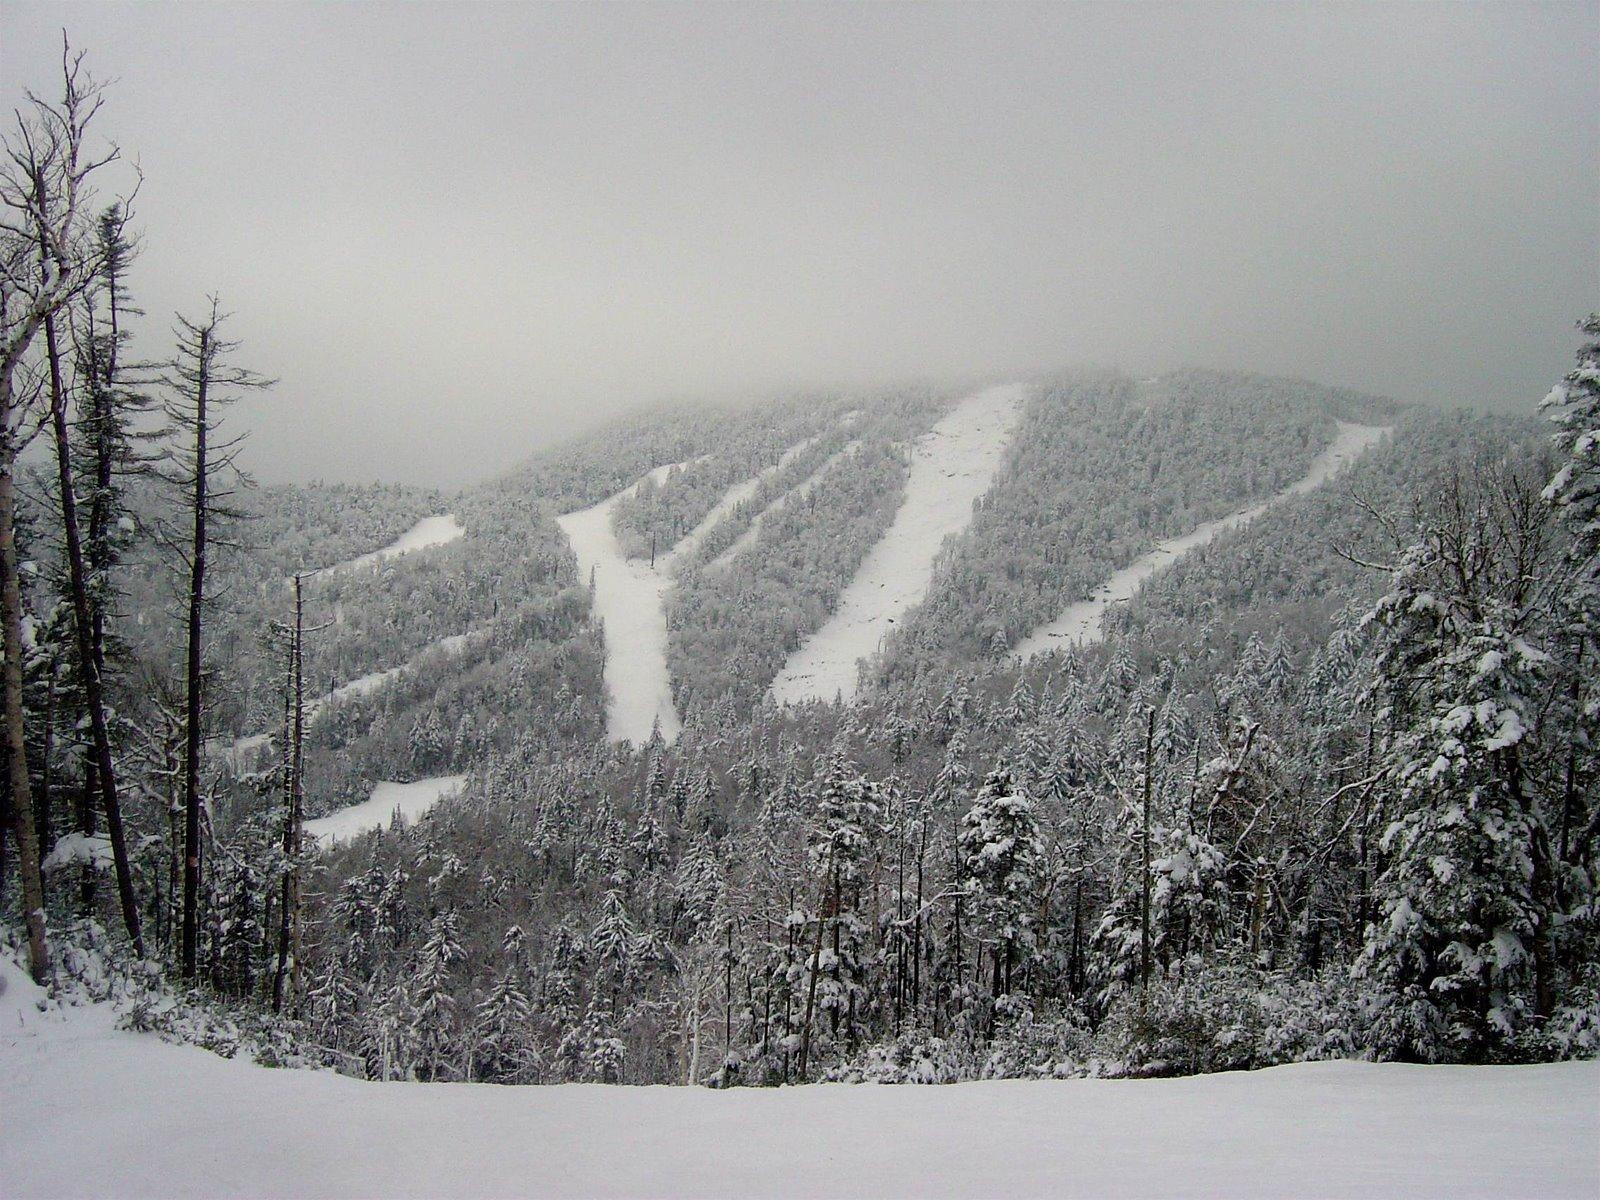 Summit from Ruby Run